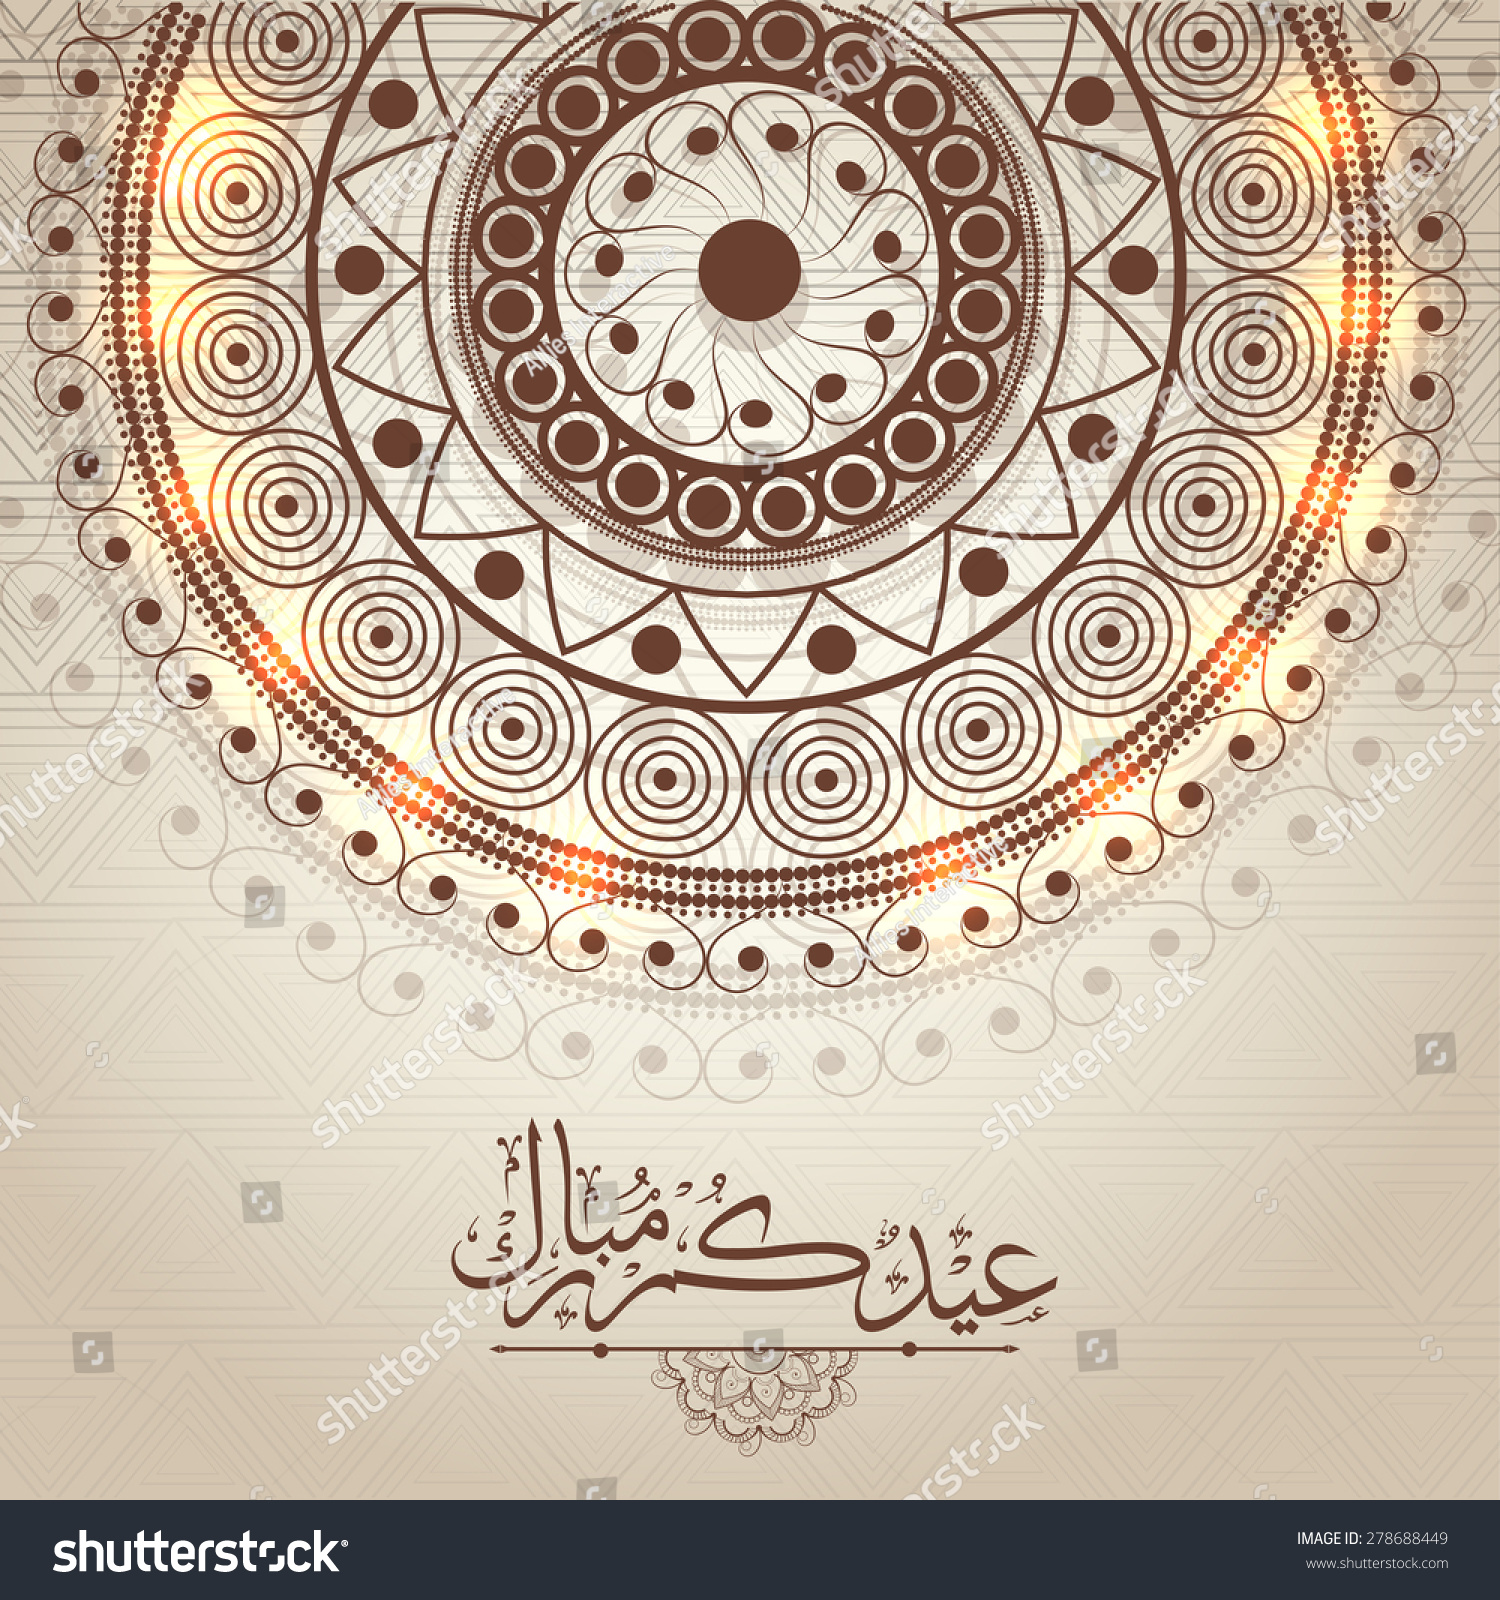 ... Arabic Islamic calligraphy of text Eid Mubarak for Muslim community